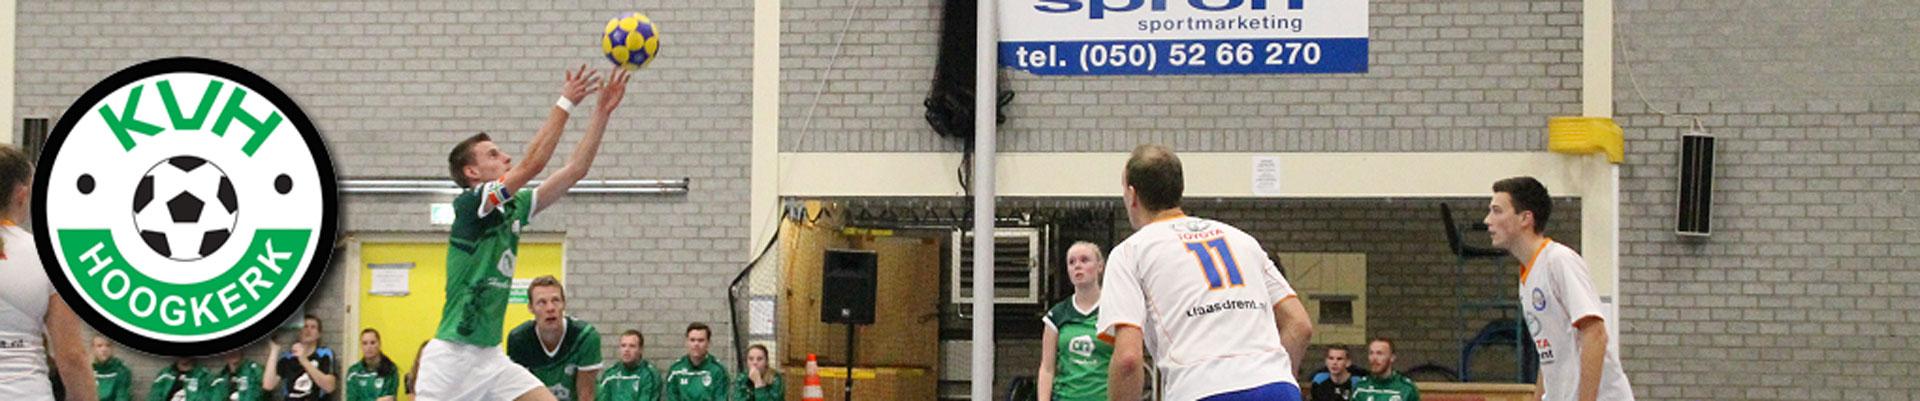 Korfbalvereniging Hoogkerk